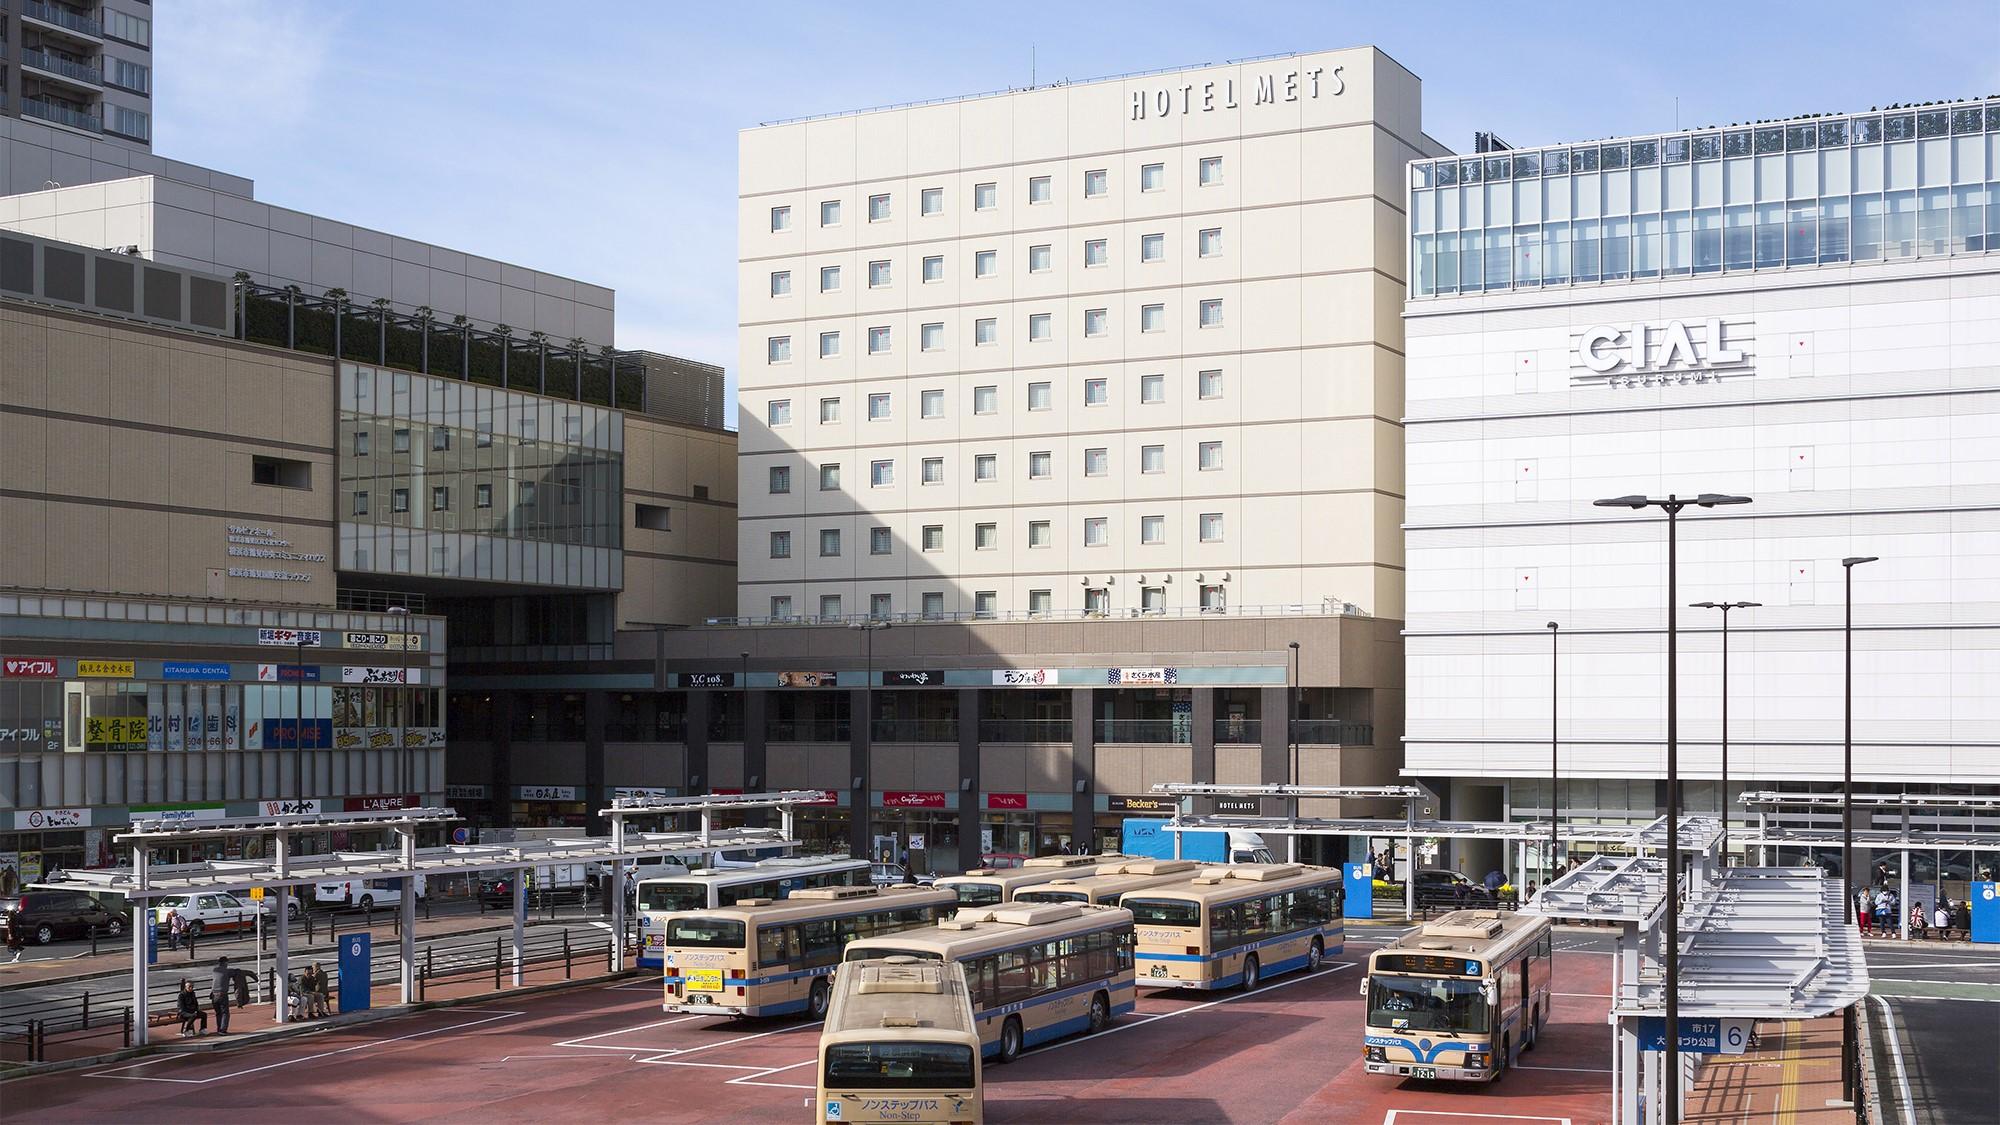 JR東日本ホテルメッツ横浜鶴見 image